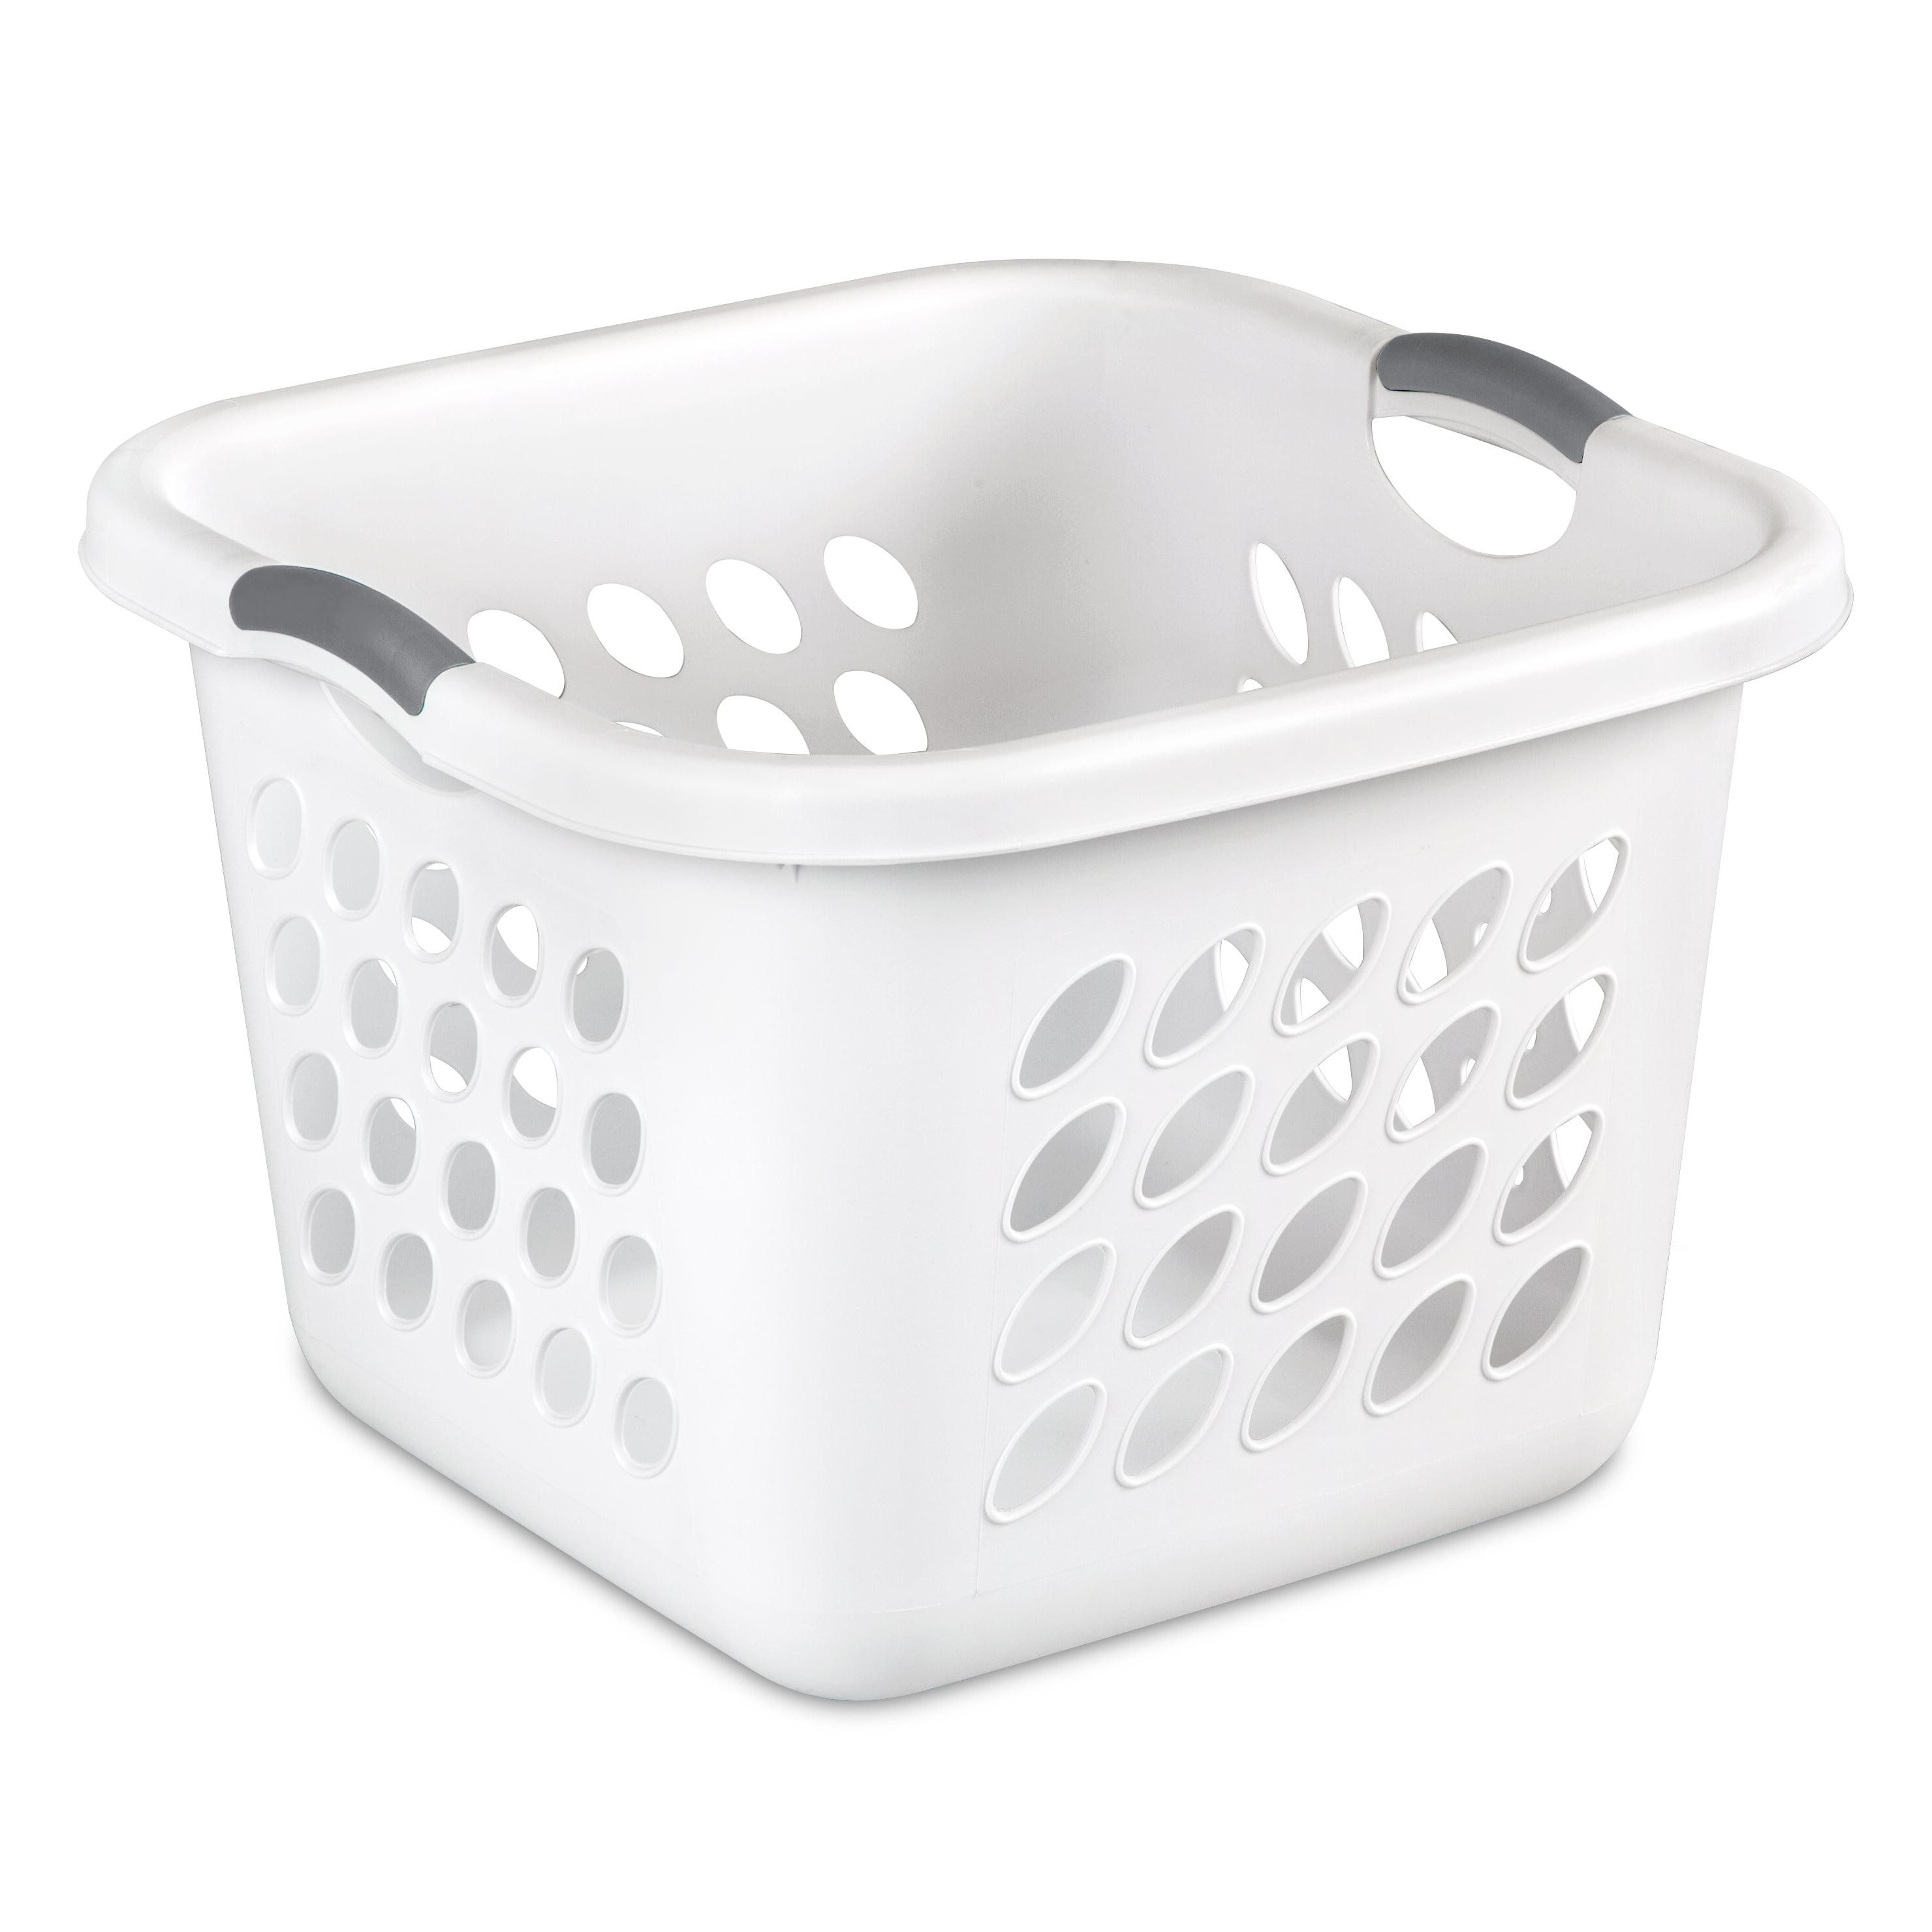 Sterilite 1.5 Bushel/53 L Ultra™ Square Laundry Basket, White